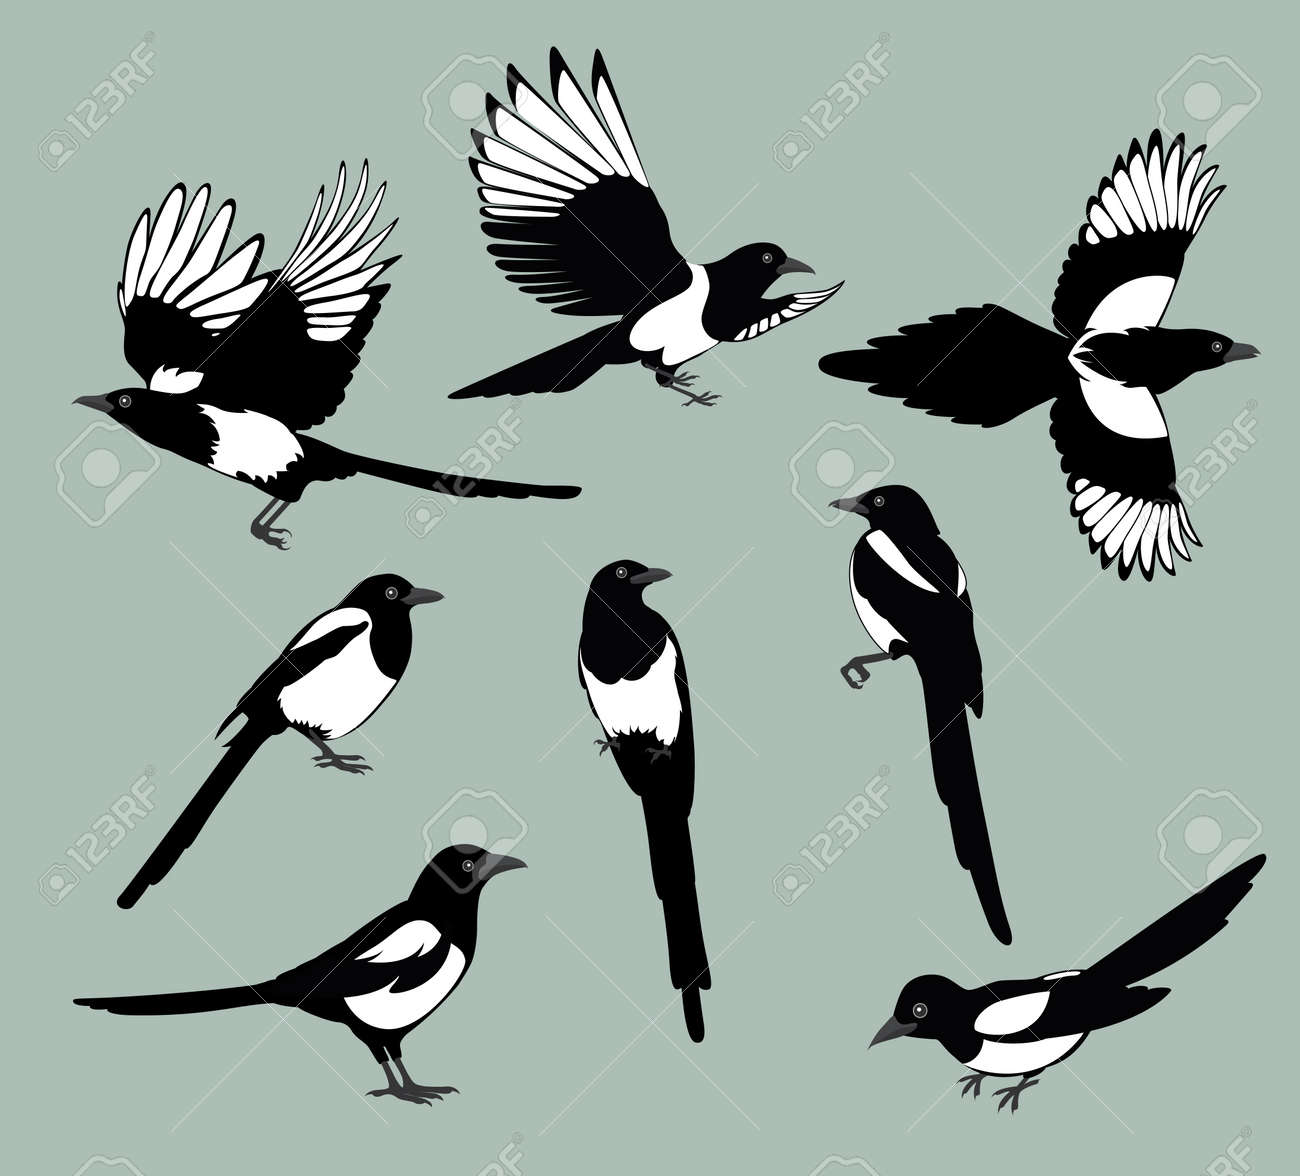 Conjunto De Siluetas Negras Vector Aislado De Urraca De Aves Poses